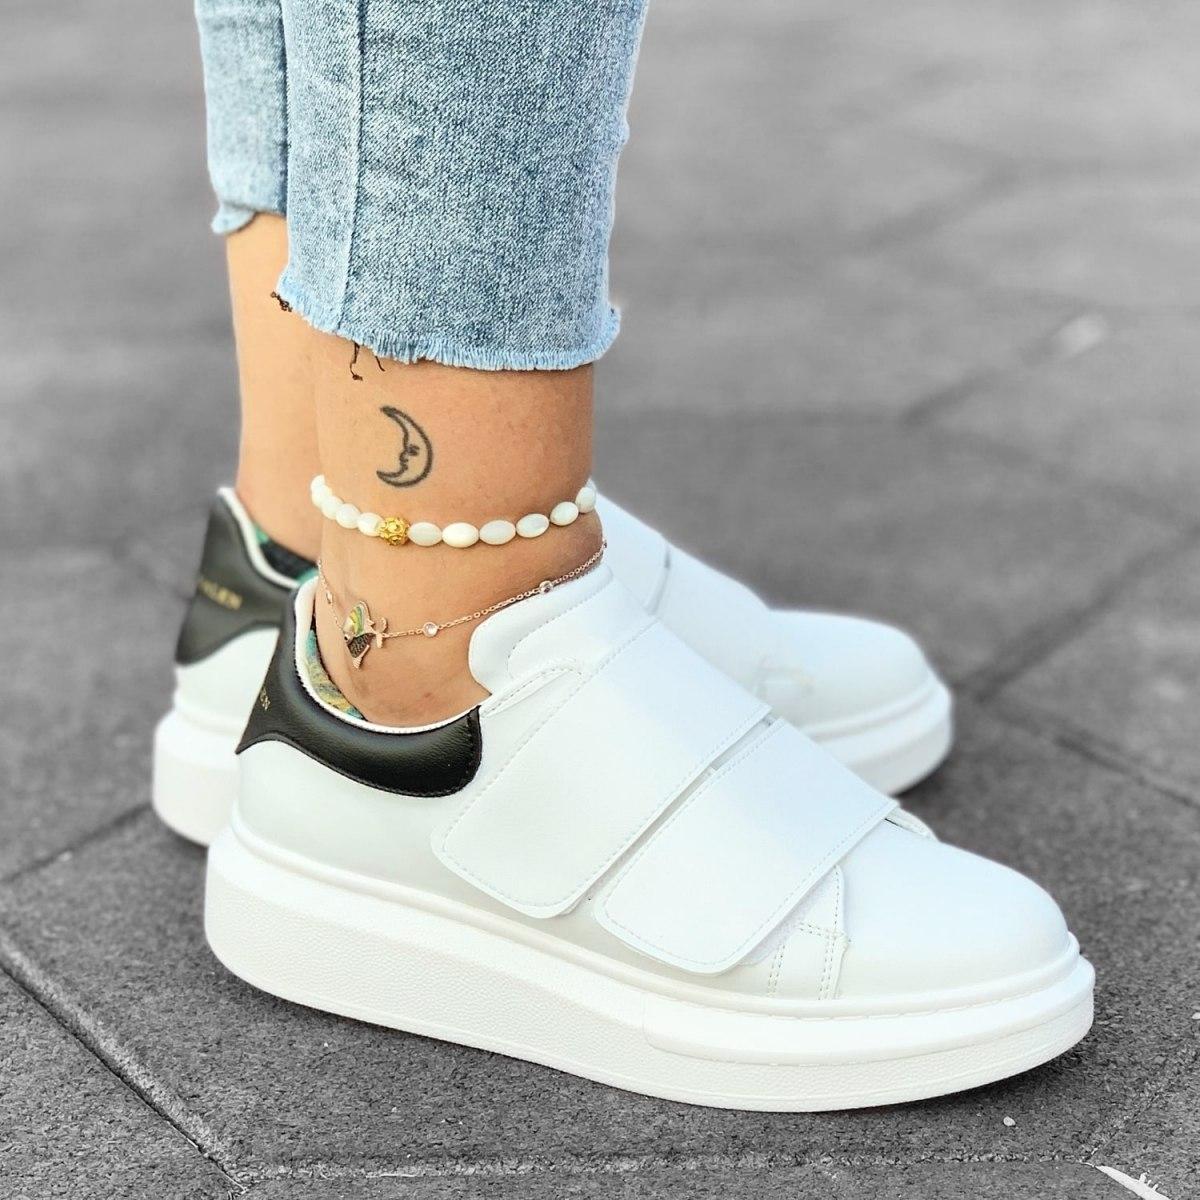 Martin Valen Women's Double Velcro Sneakers White